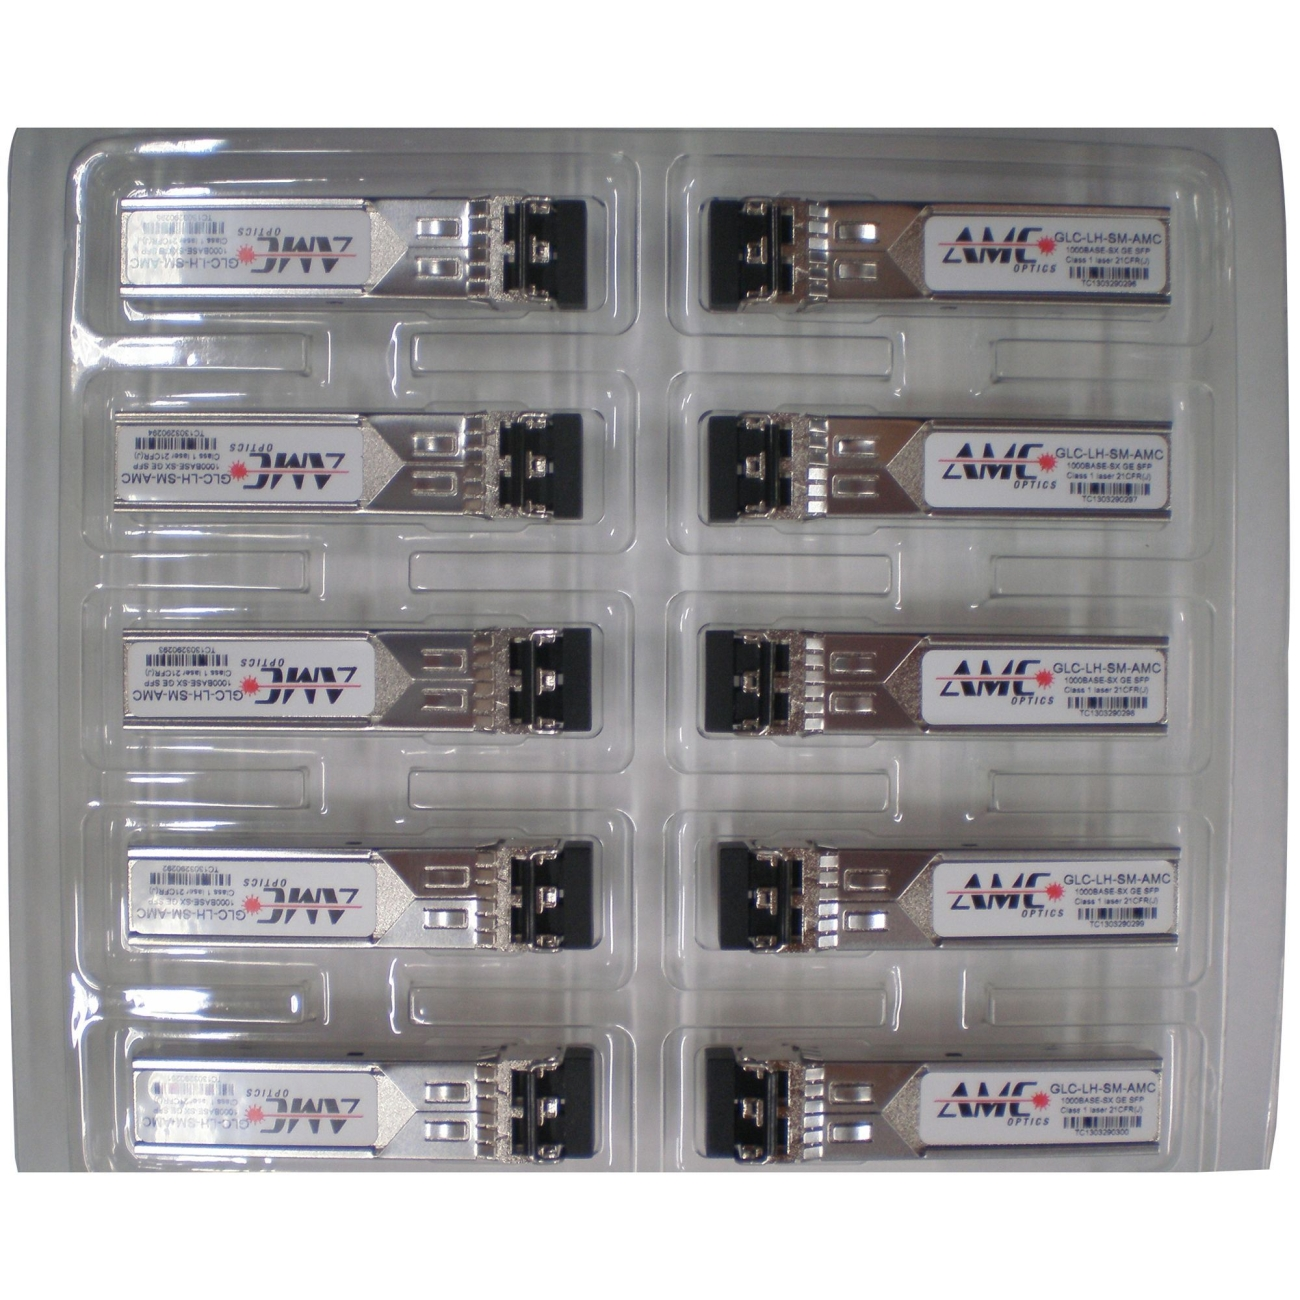 Amc Optics GLC-LH-SM-10PK-AMC 10pk Glc-lh-sm Compatible Cpnt Buy 9pcs Get 1 Free